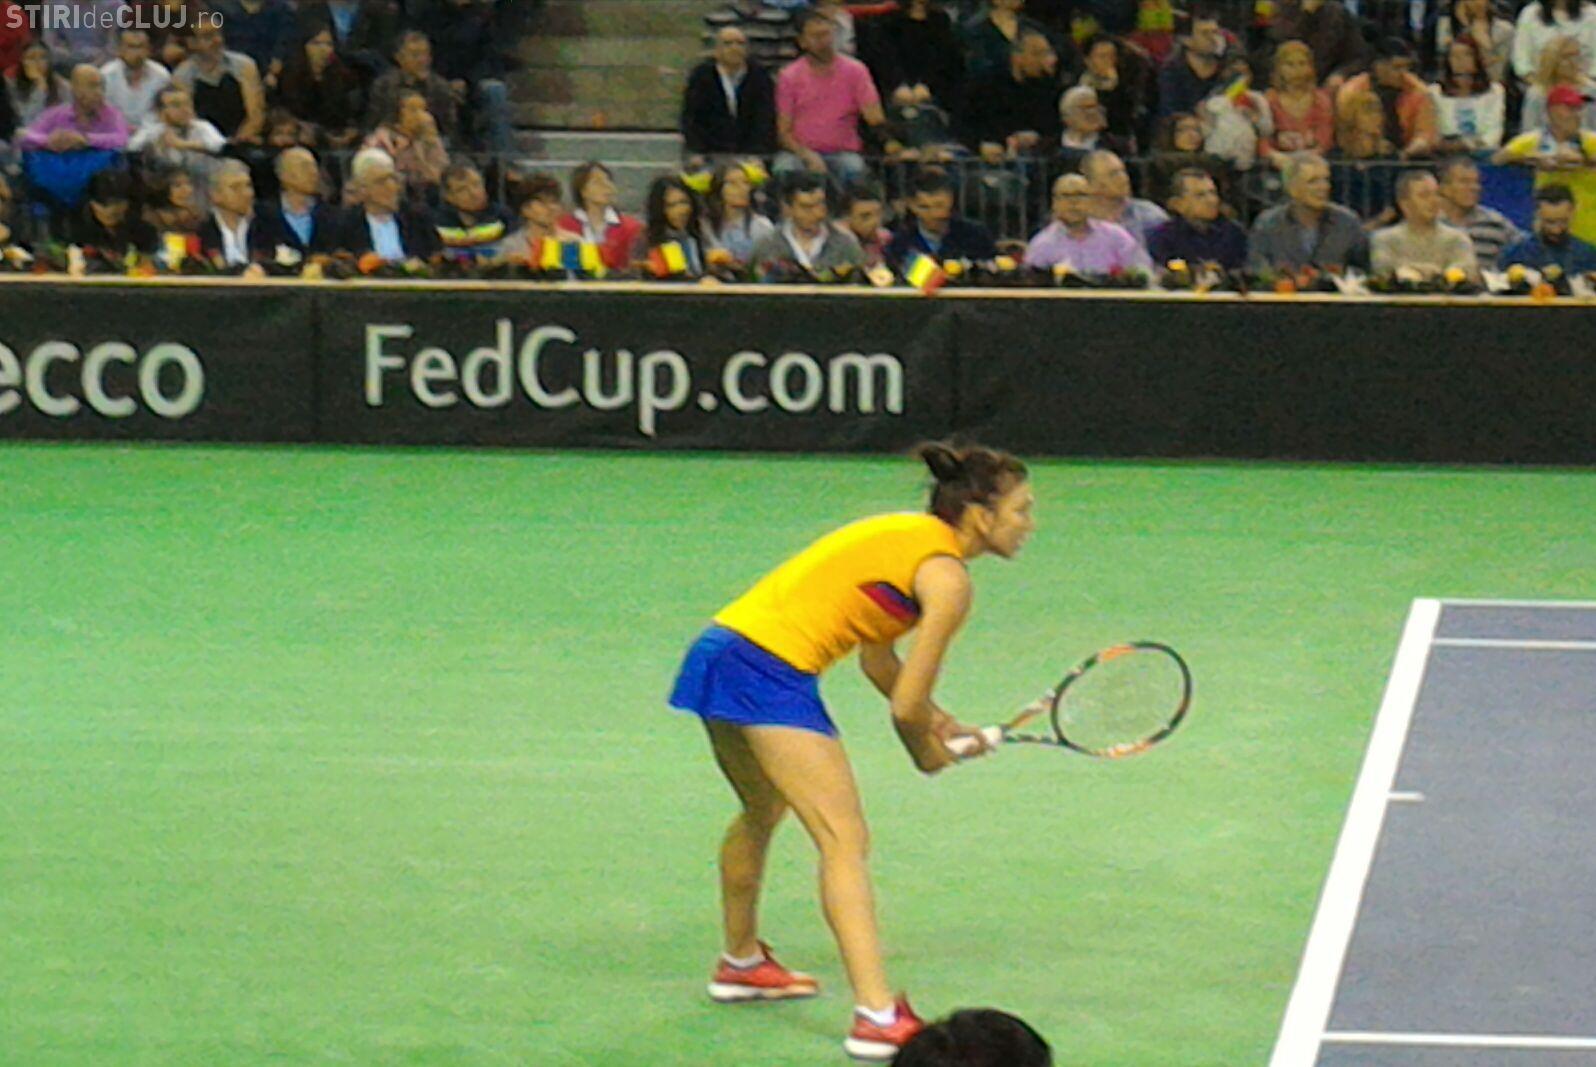 Simona Halep a pierdut la Fed Cup meciul cu Karolina Pliskova